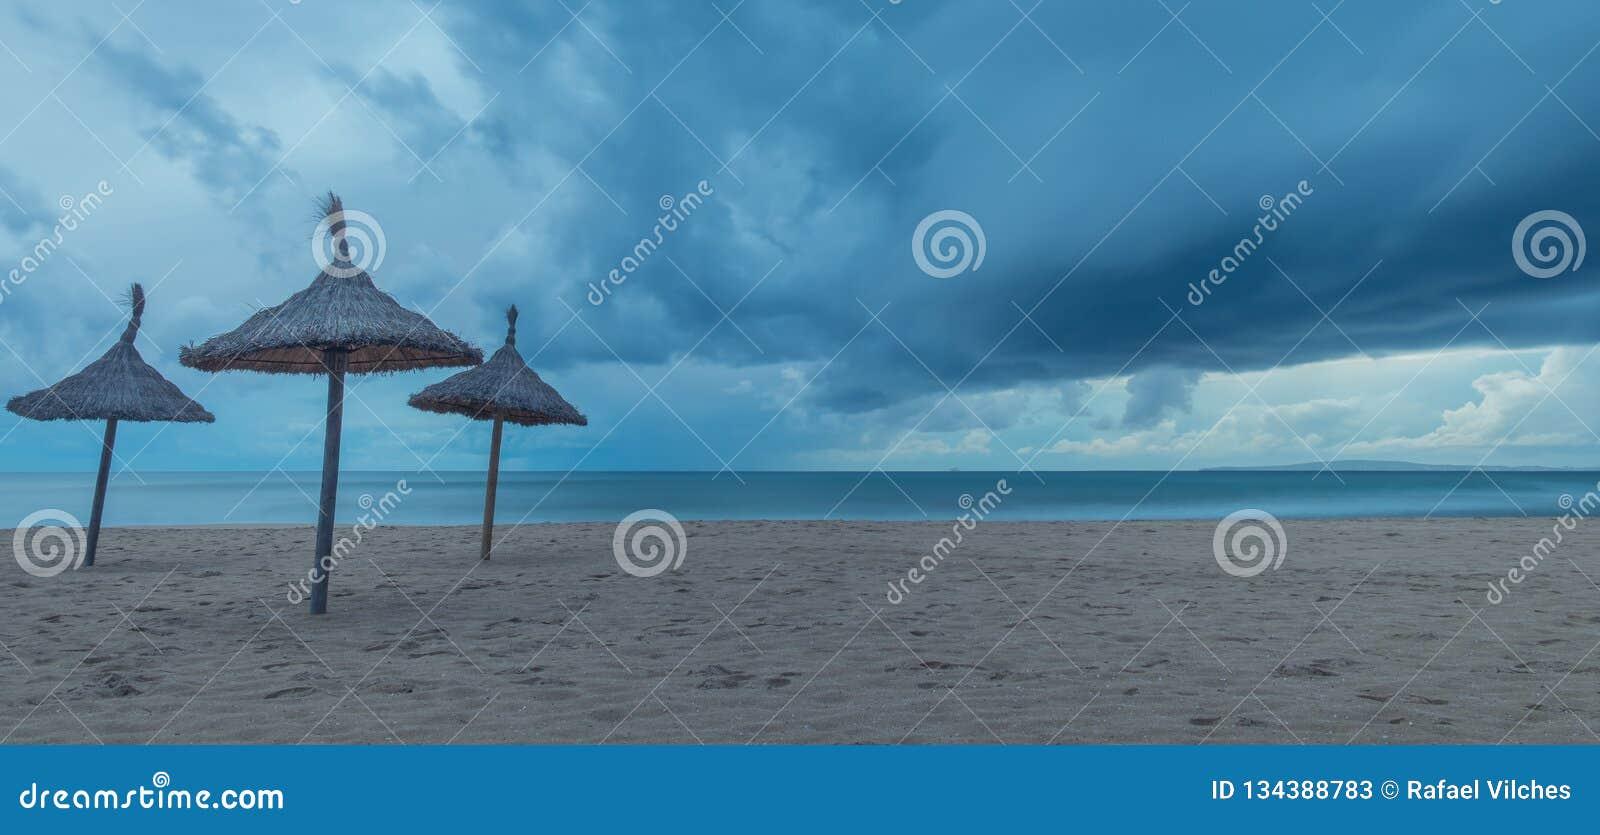 Umbrellas on the storm